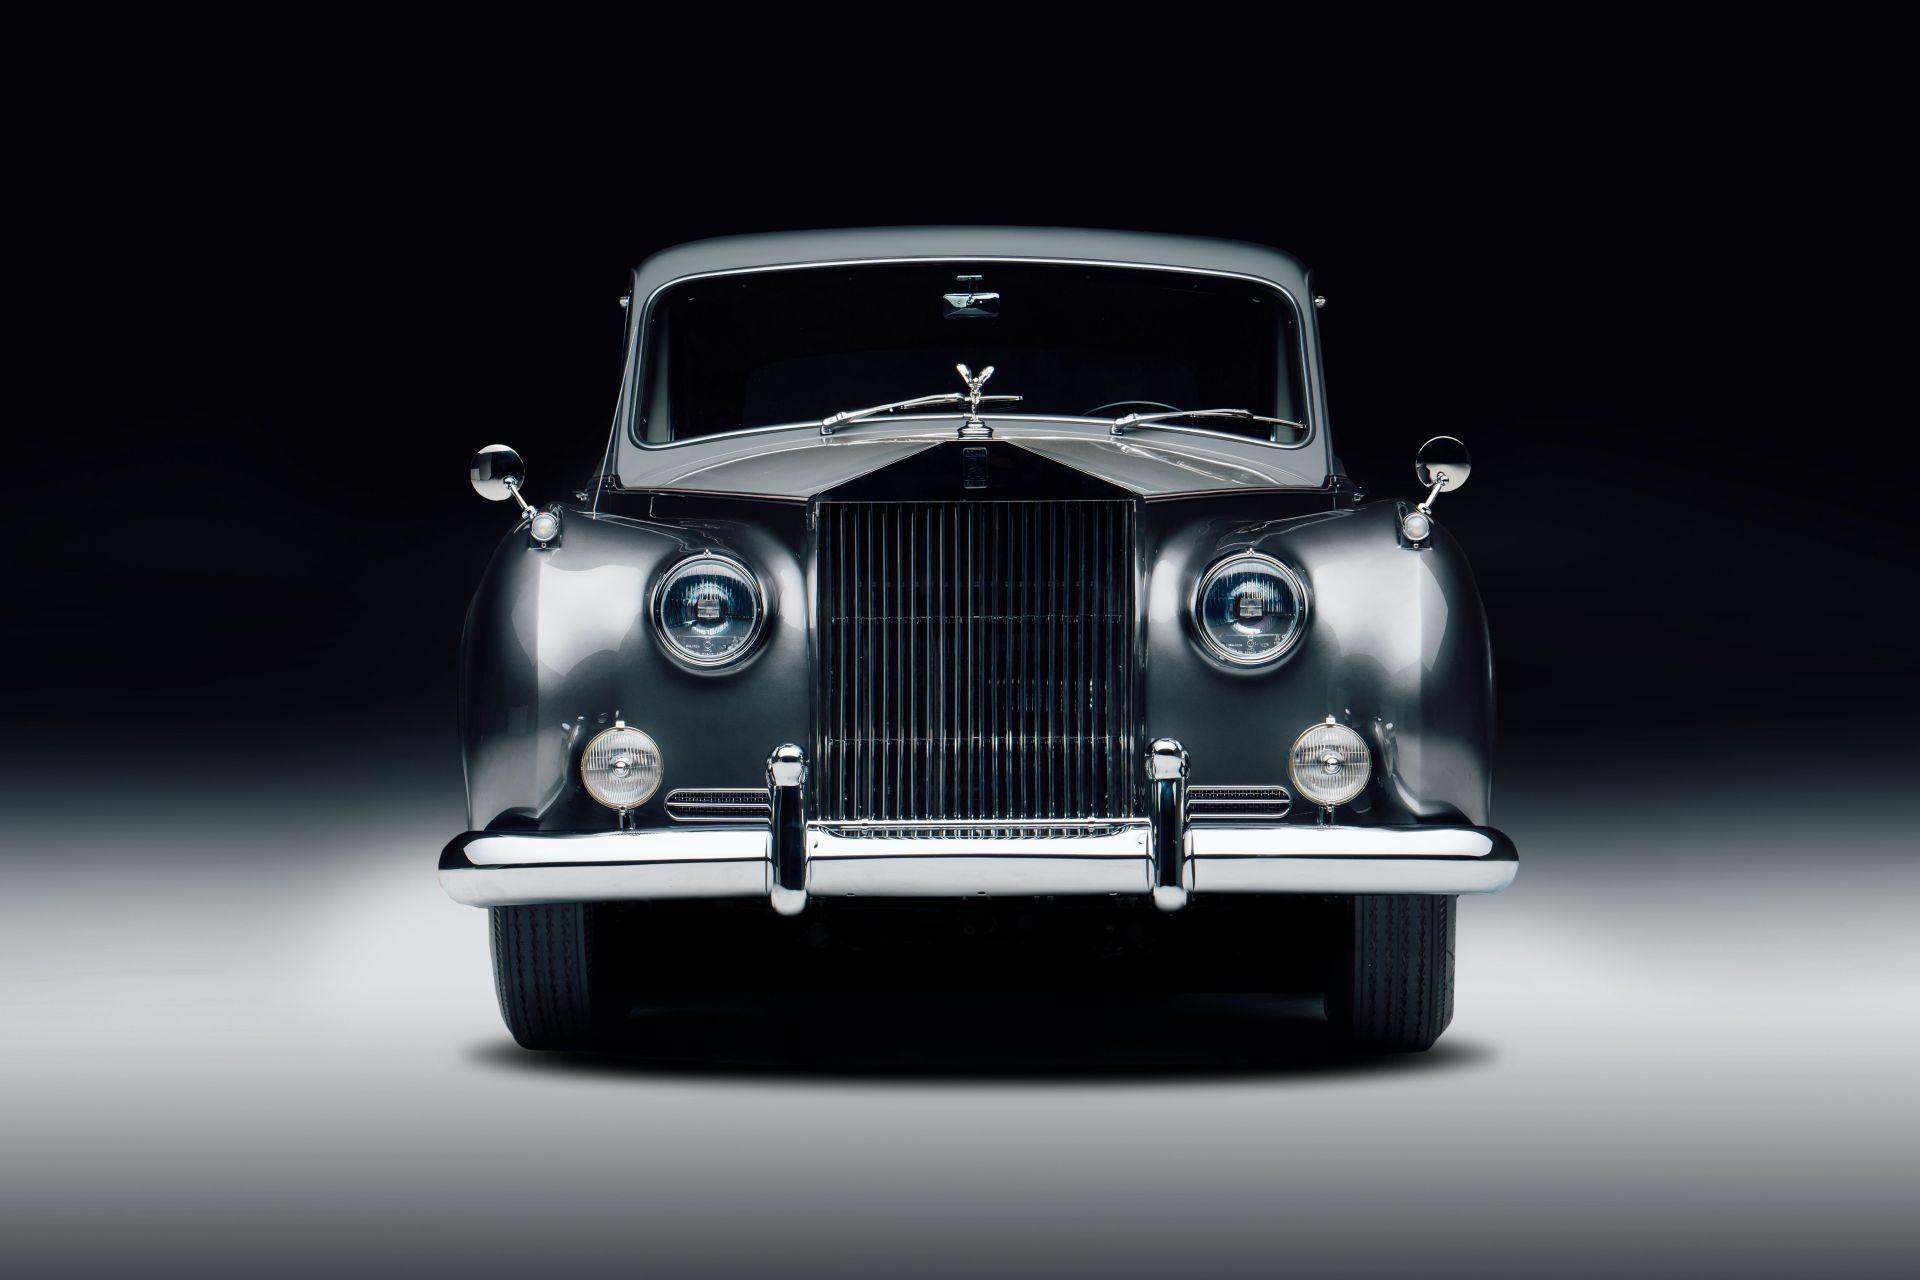 Electris-Rolls-Royce-Phantom-V-and-Silver-Cloud-by-Lunaz-18